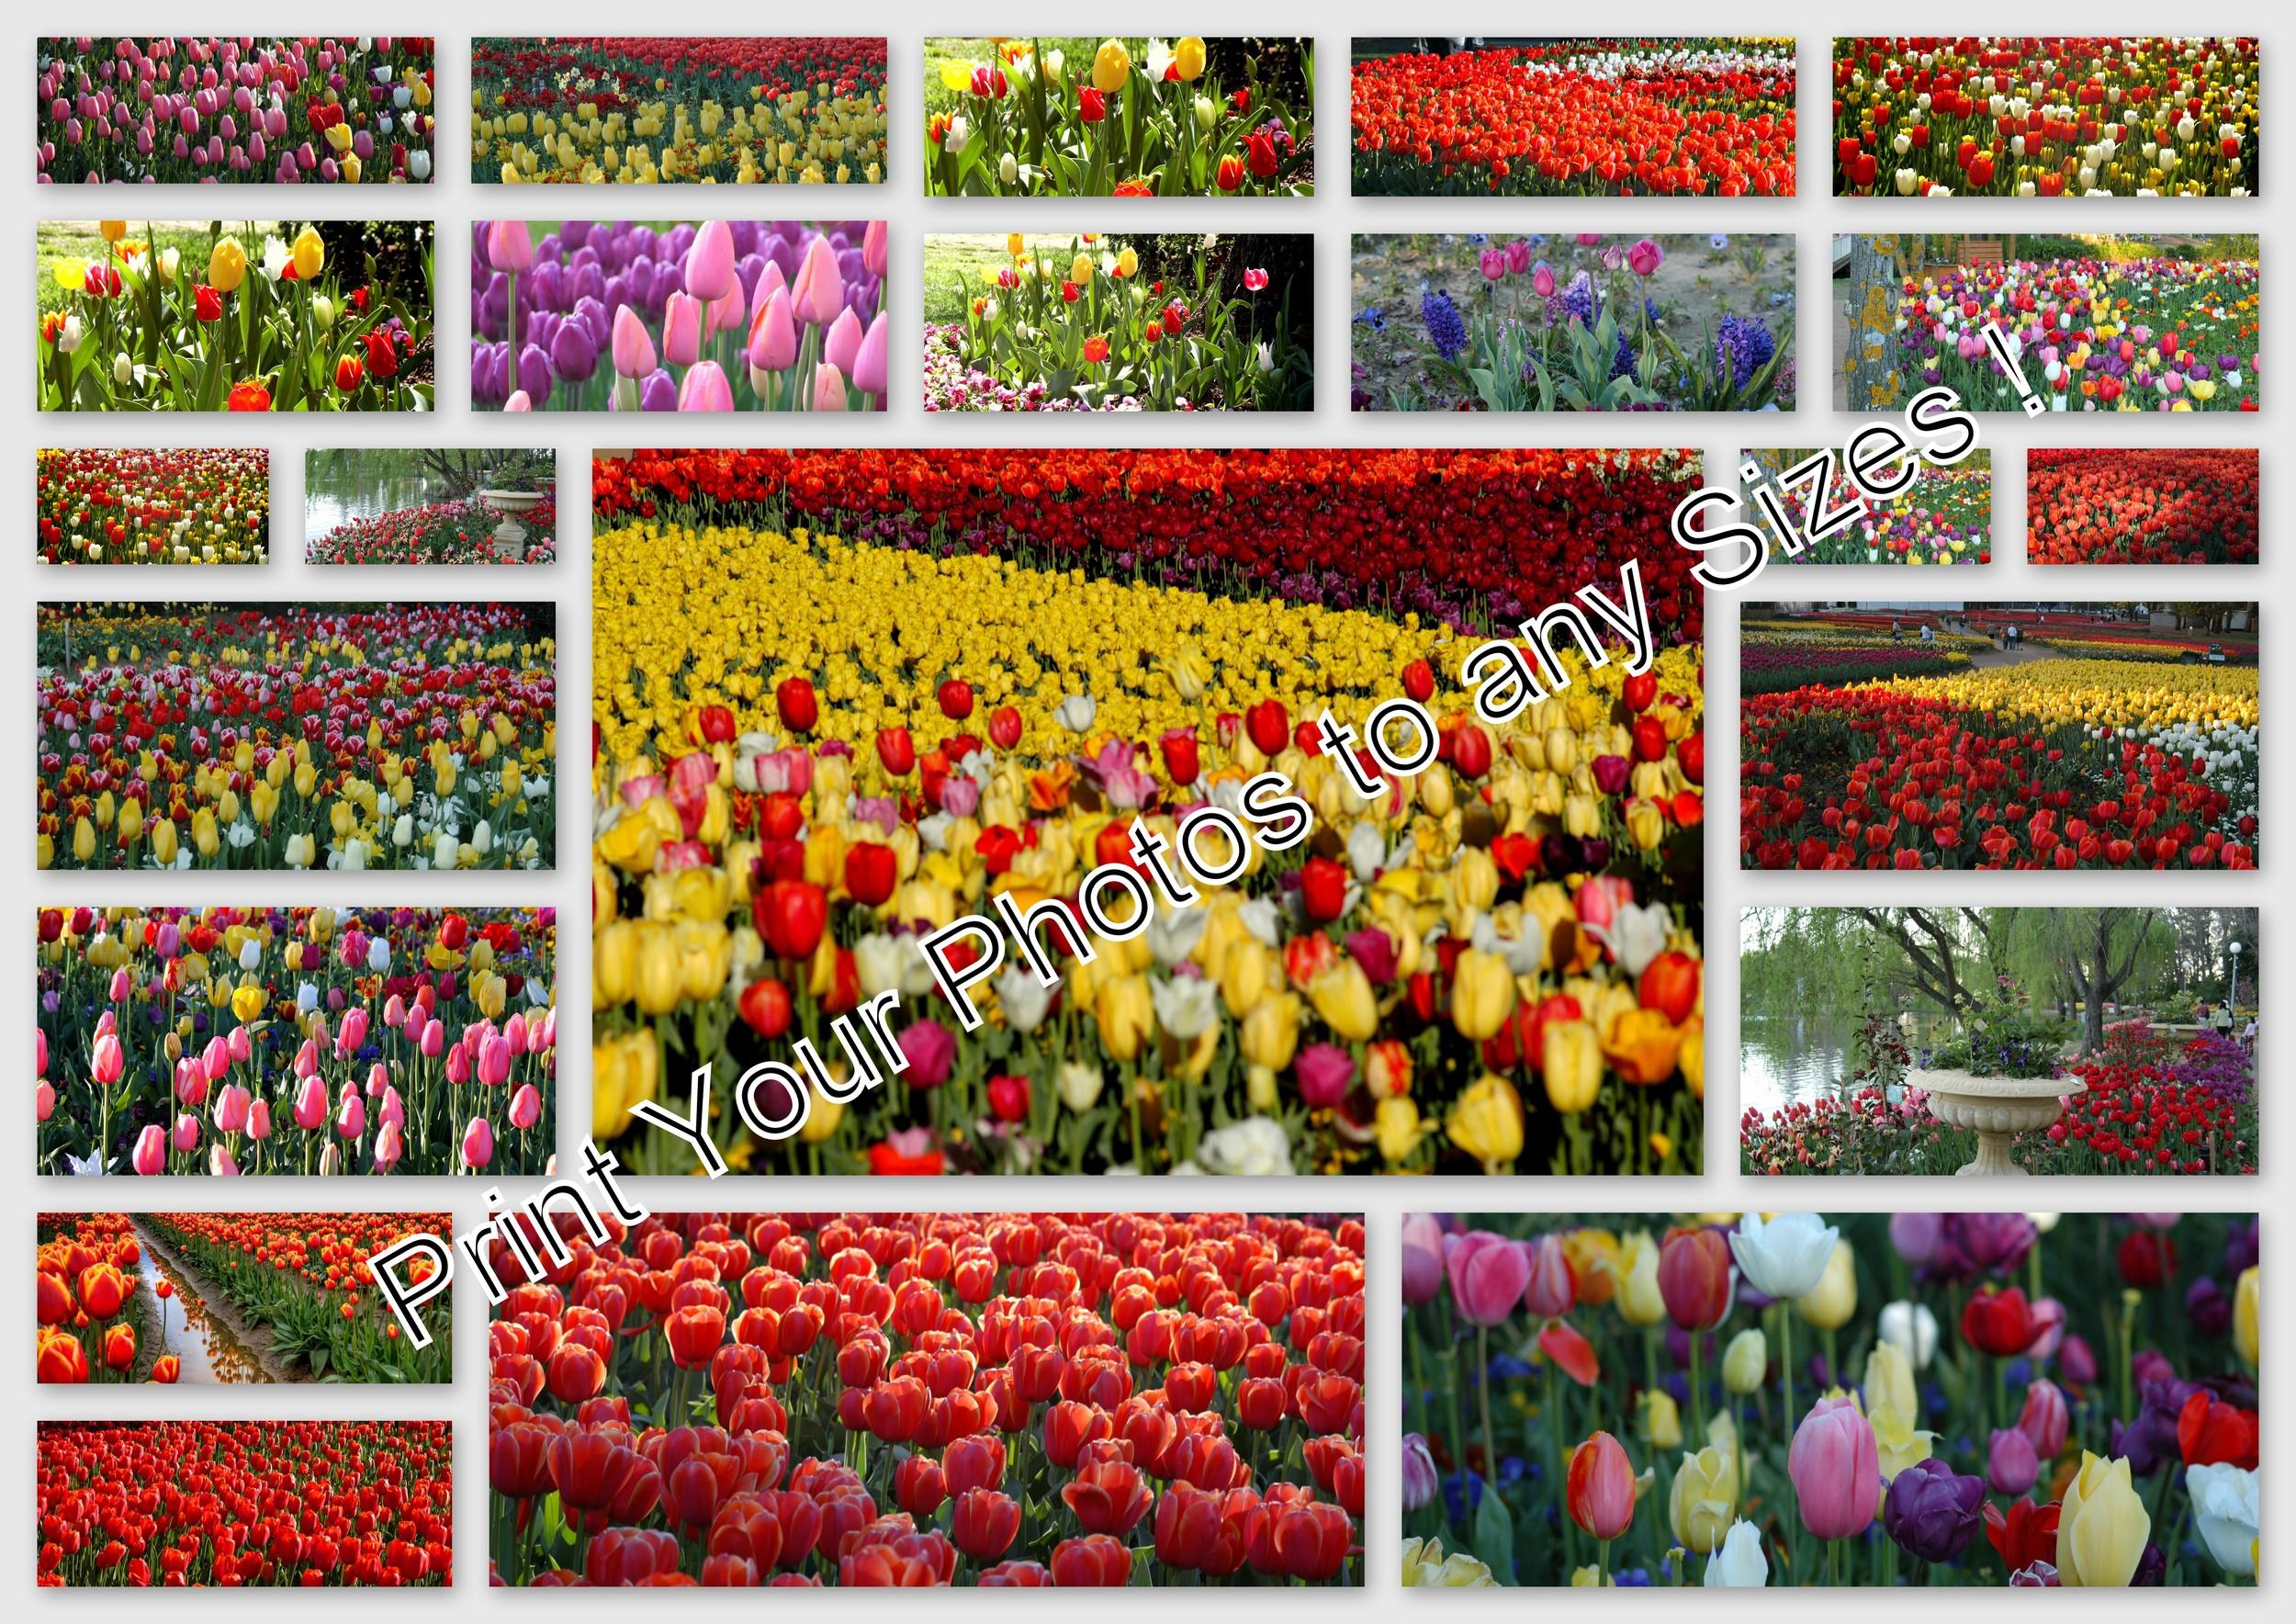 1-01102005 100ND100 - Canberra, Tulip.jpg